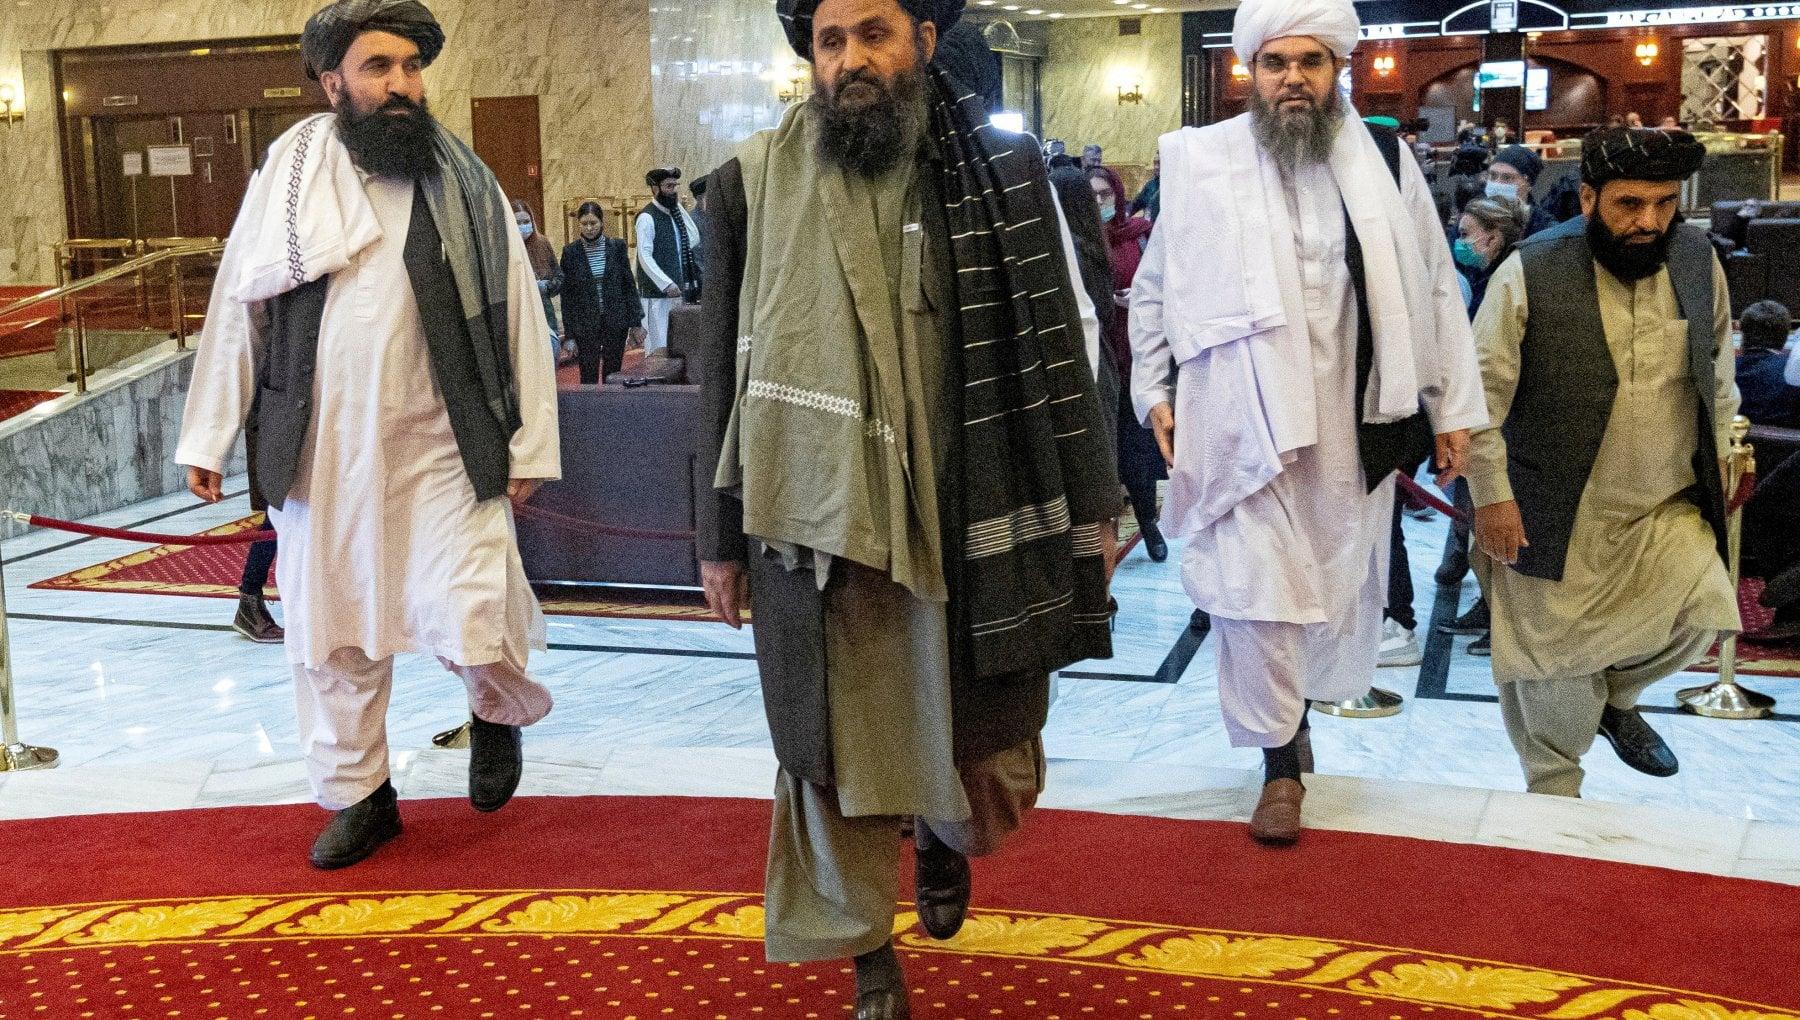 102111783 5cef70de 8554 4ee7 9d08 89089b72b58b - Afghanistan, scontro nel palazzo presidenziale tra i talebani